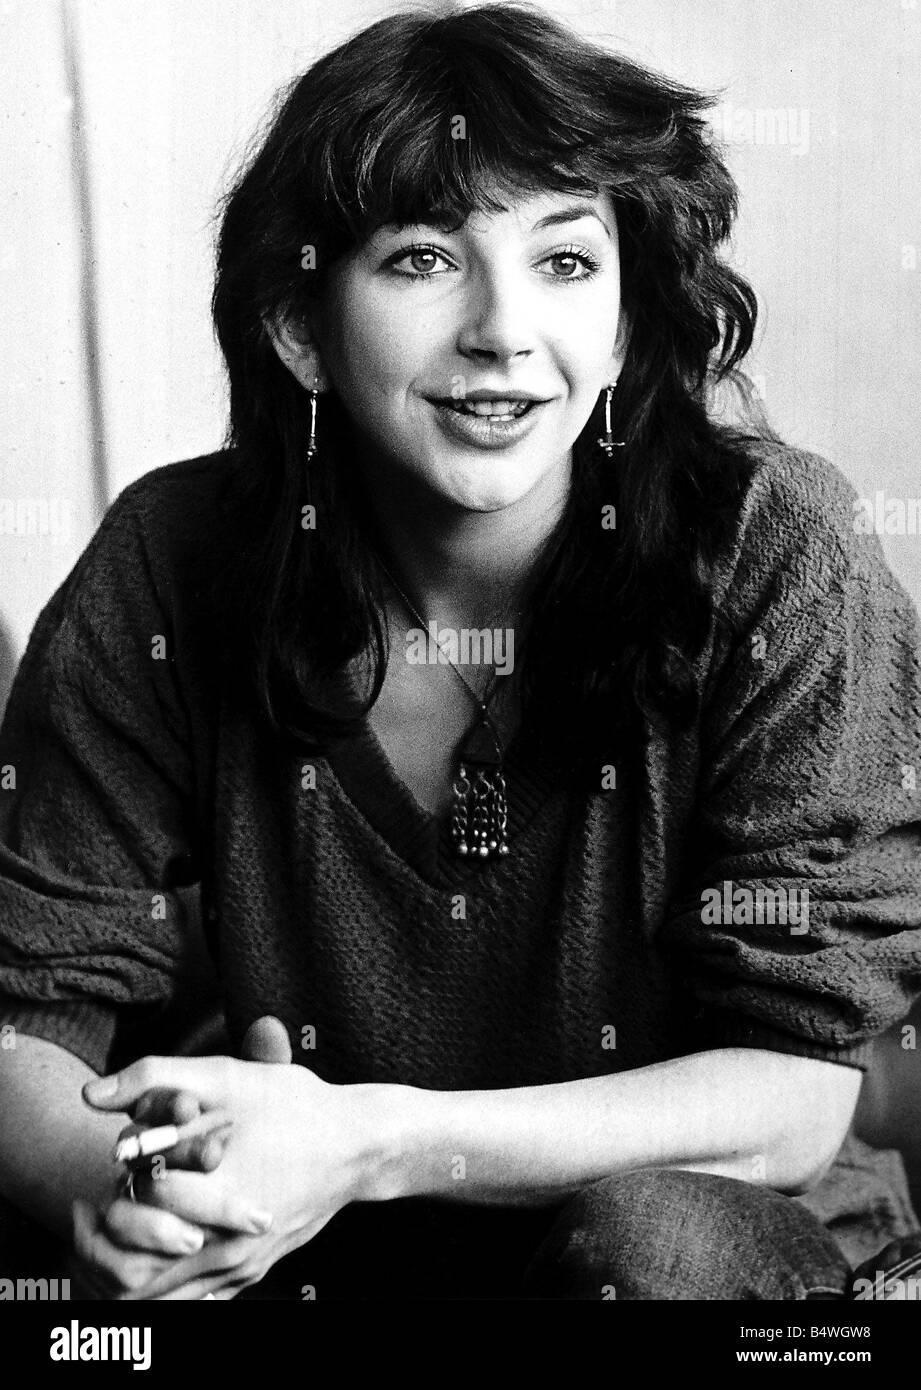 Pop singer Kate Bush singer portrait May 1979 - Stock Image